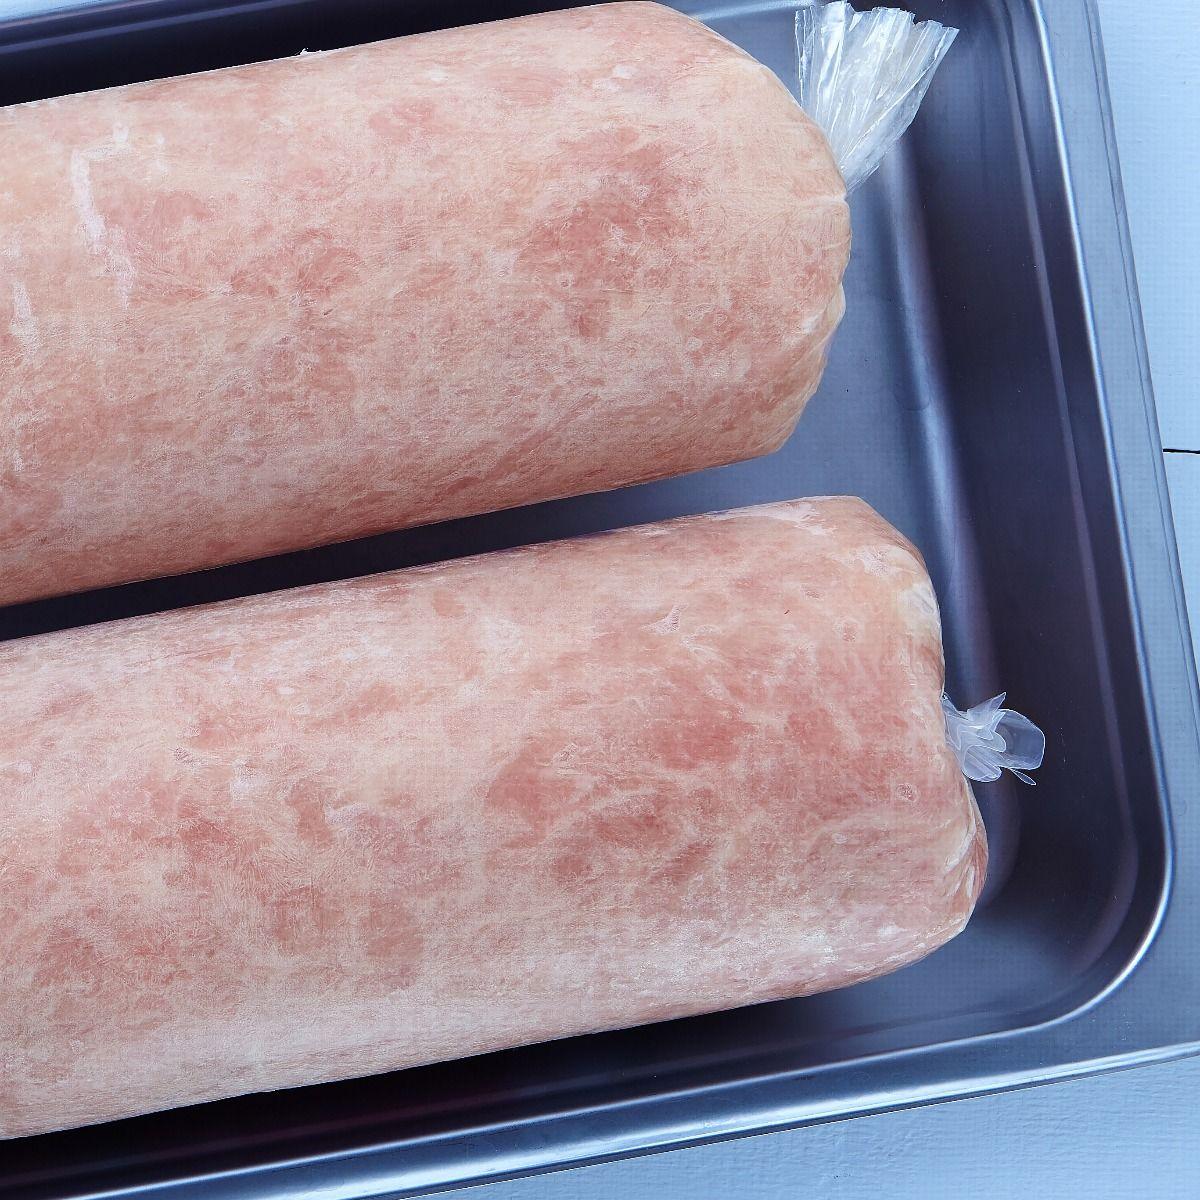 Boneless turkey breast roast (seasoned)